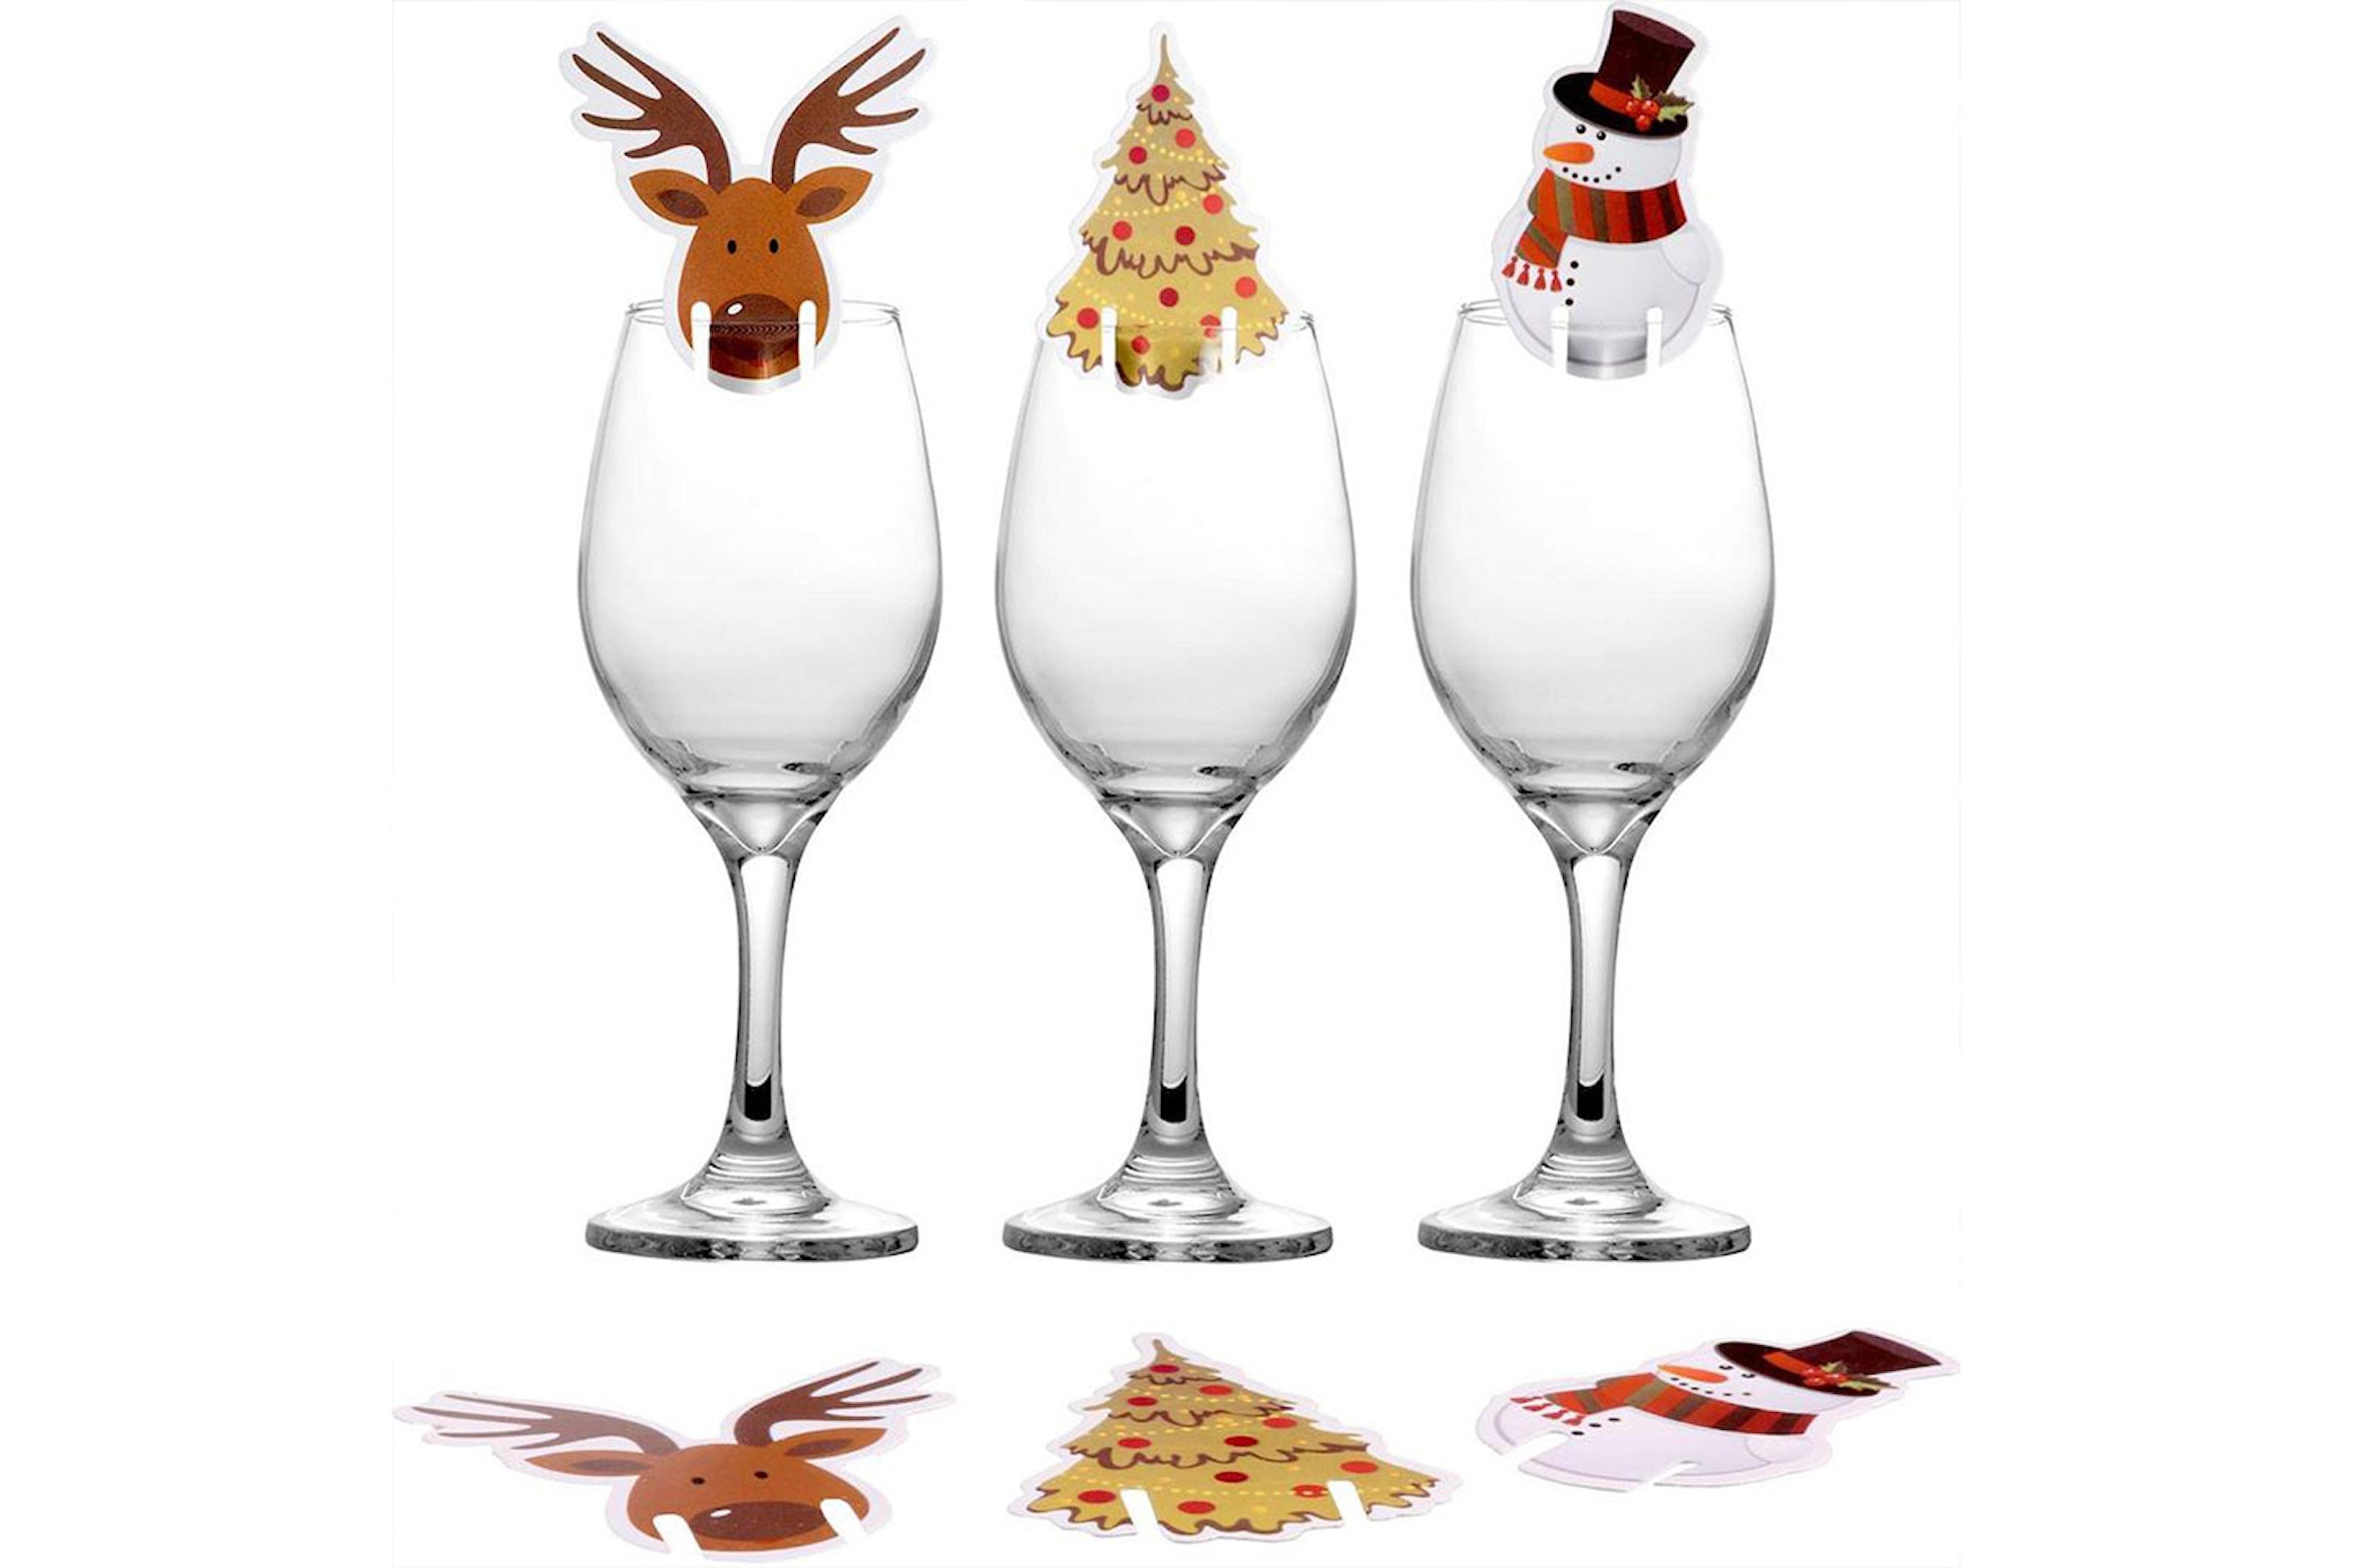 Vinglassetiketter med julemotiv